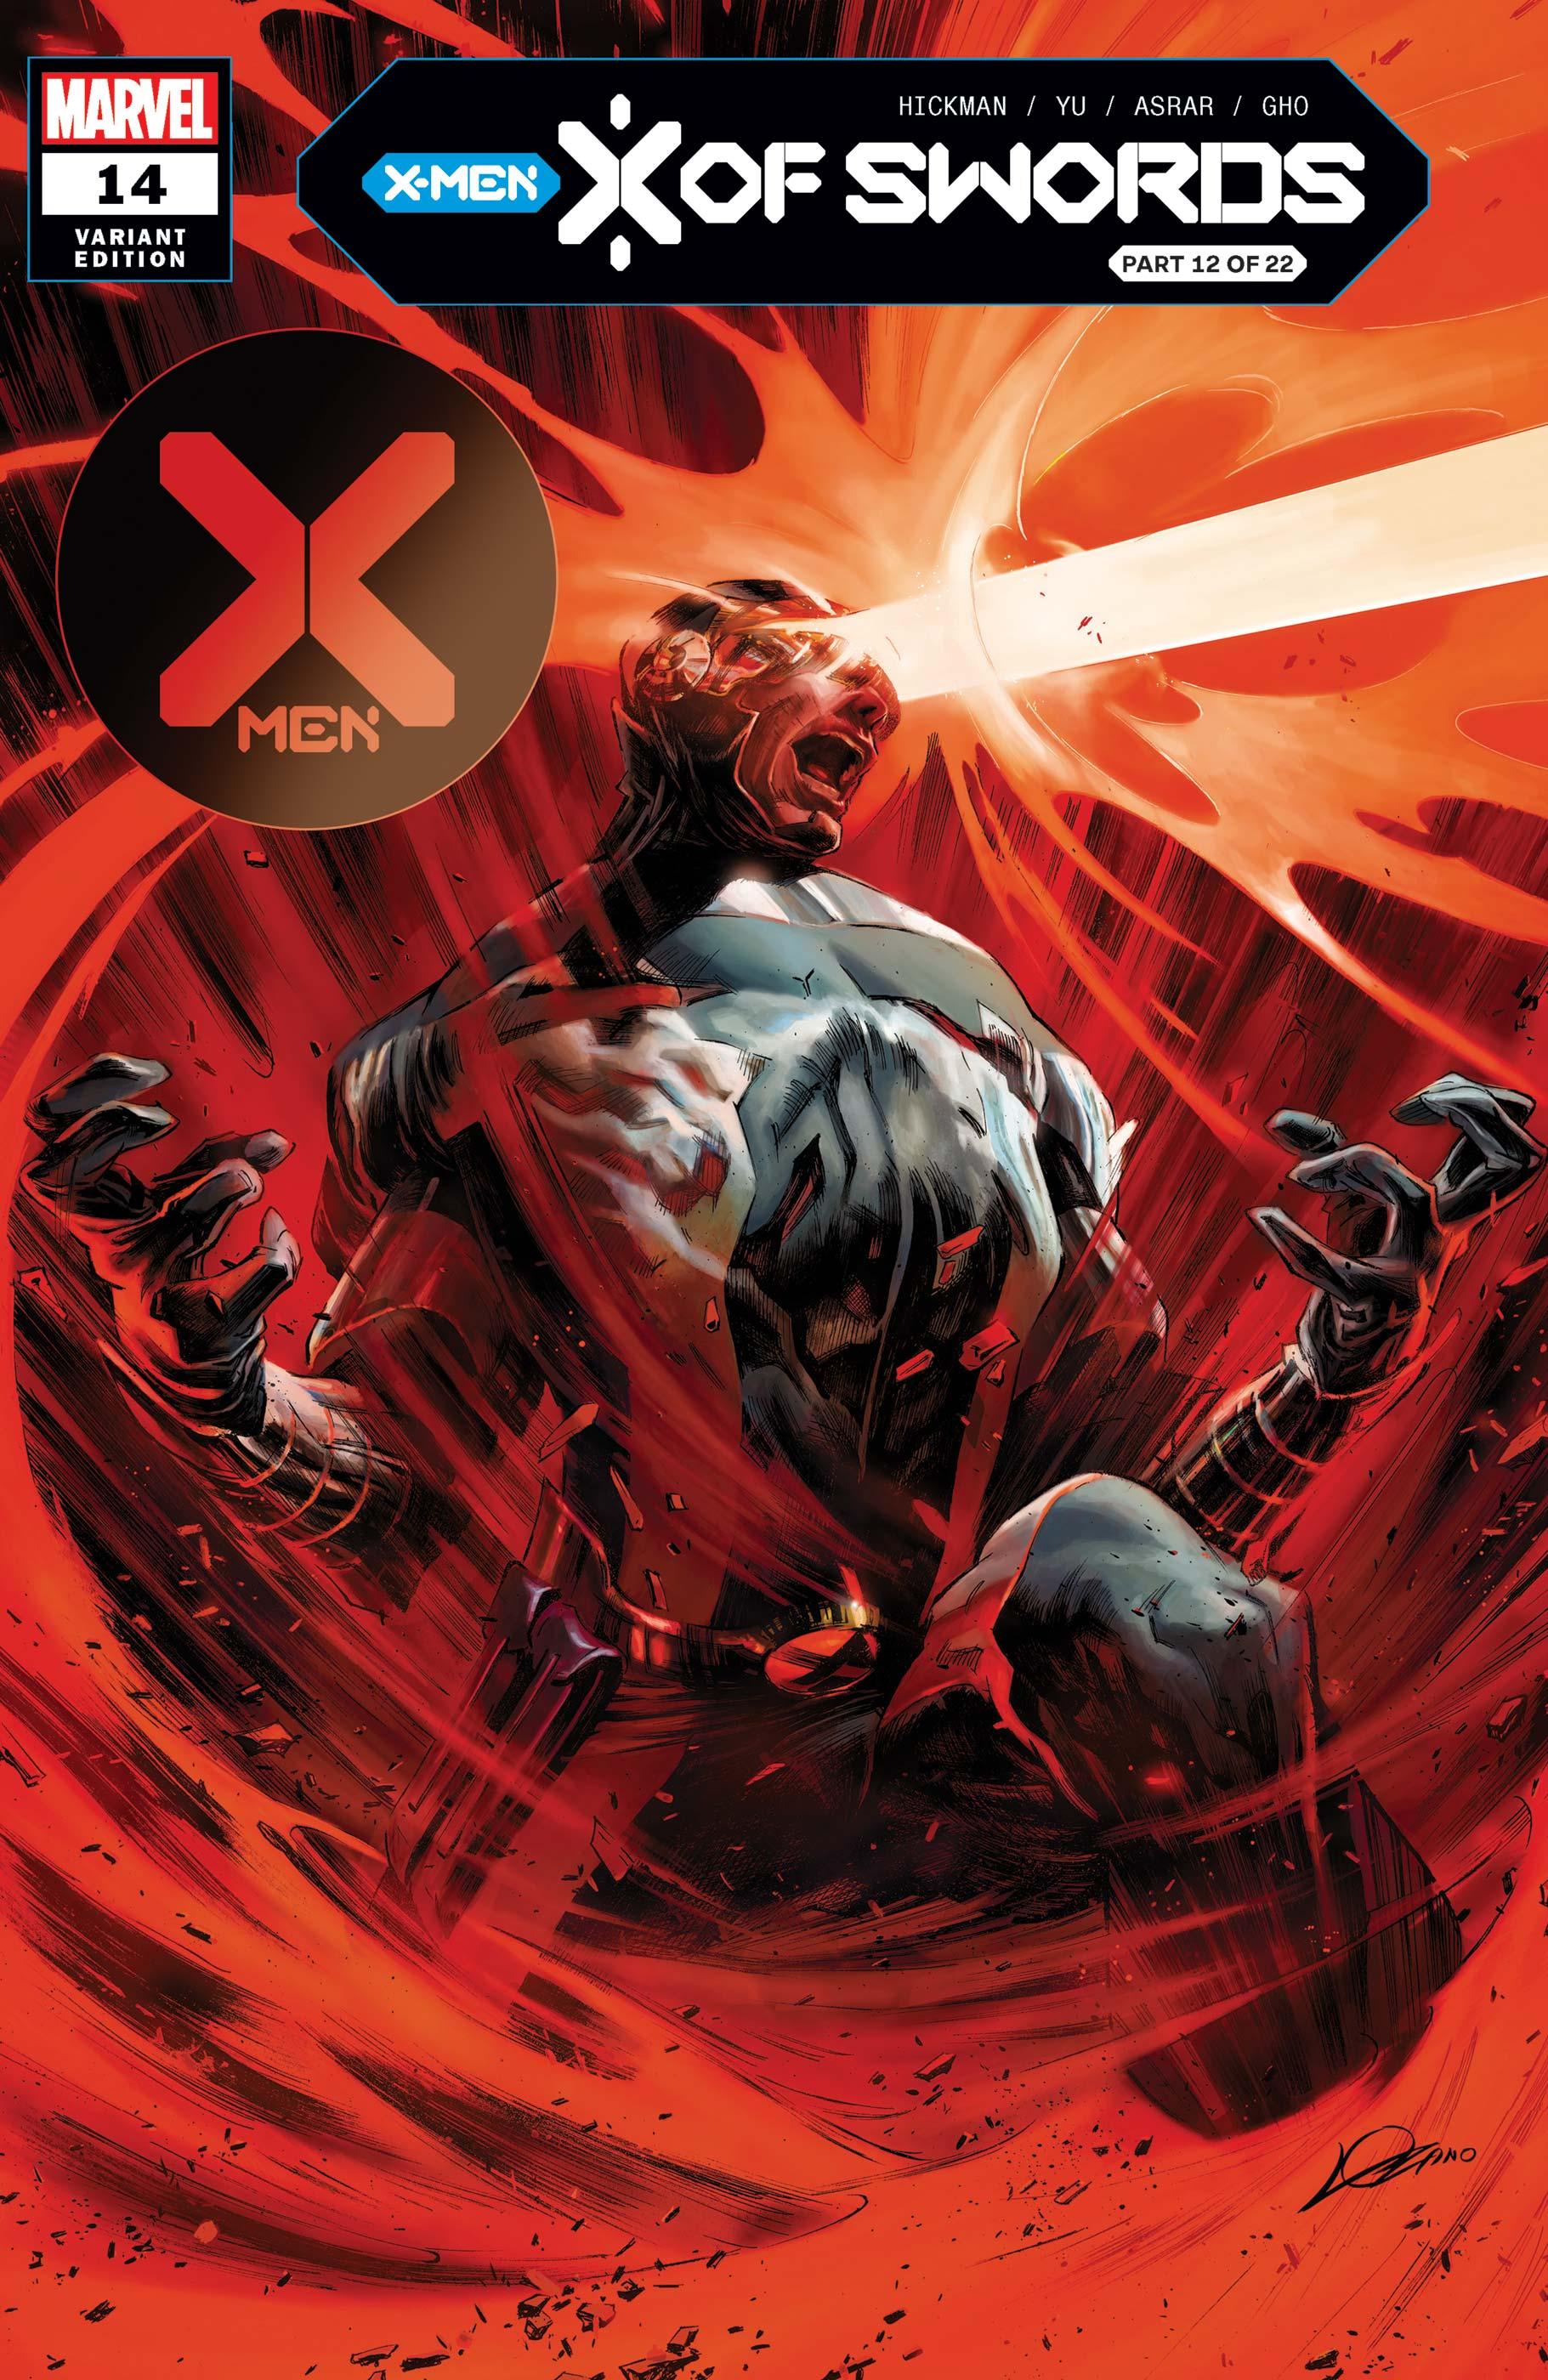 X-Men (2019) #14 (Variant)